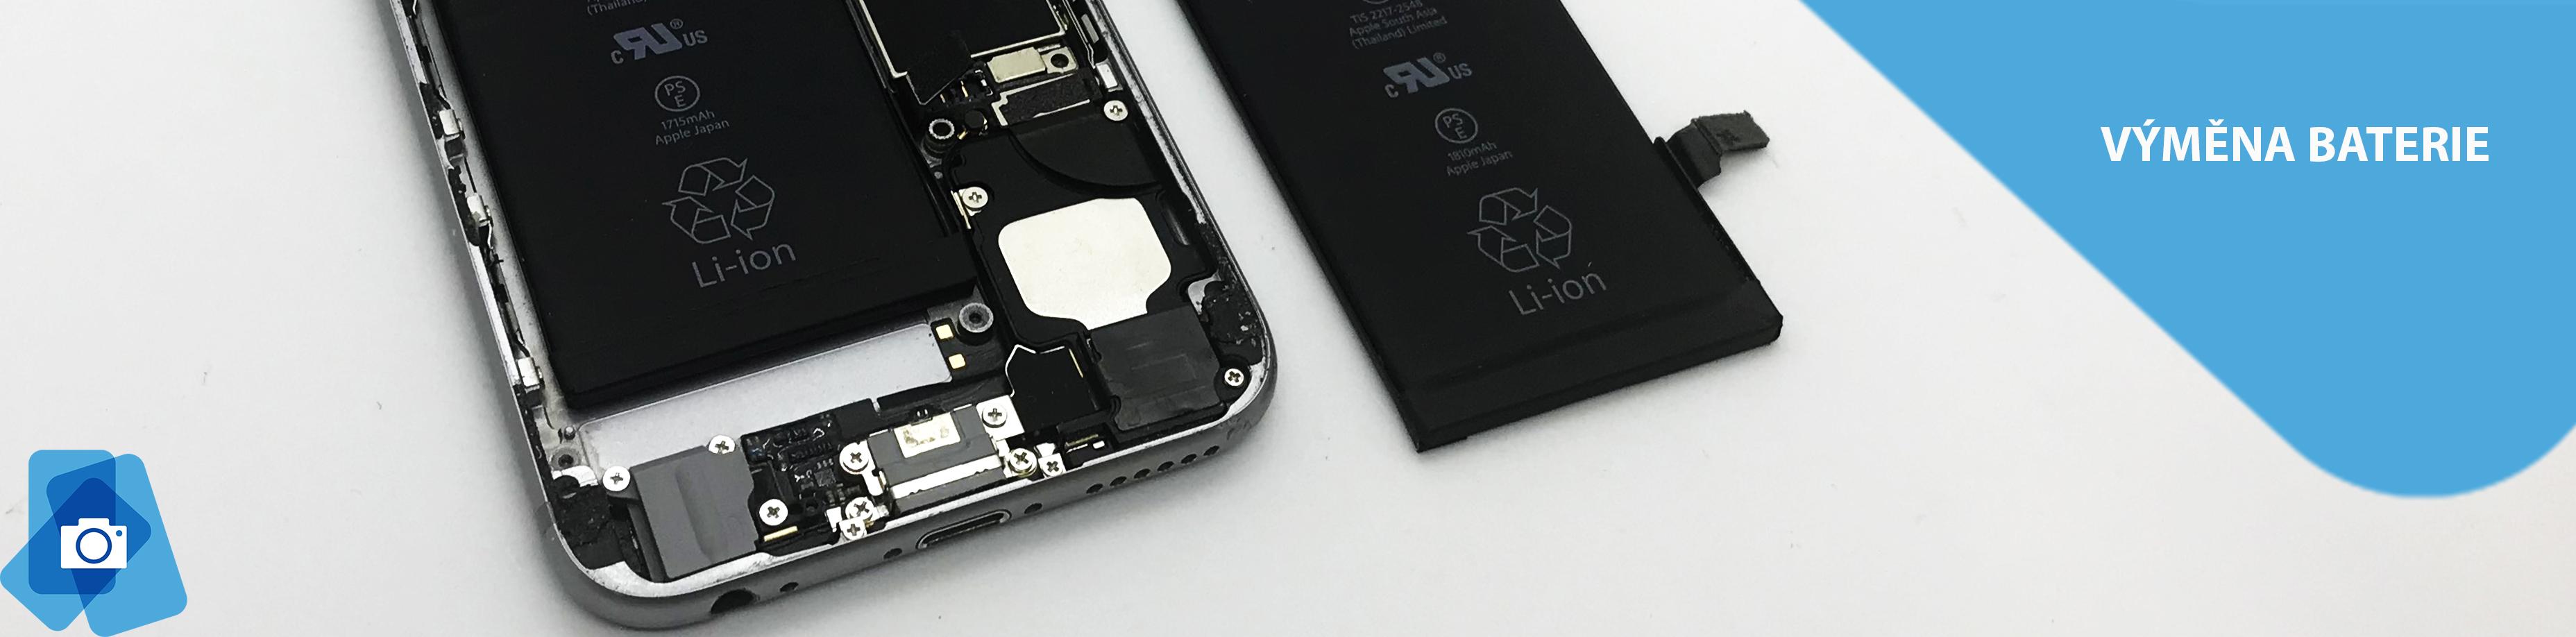 Výměna Baterie v iPhone Praha 5